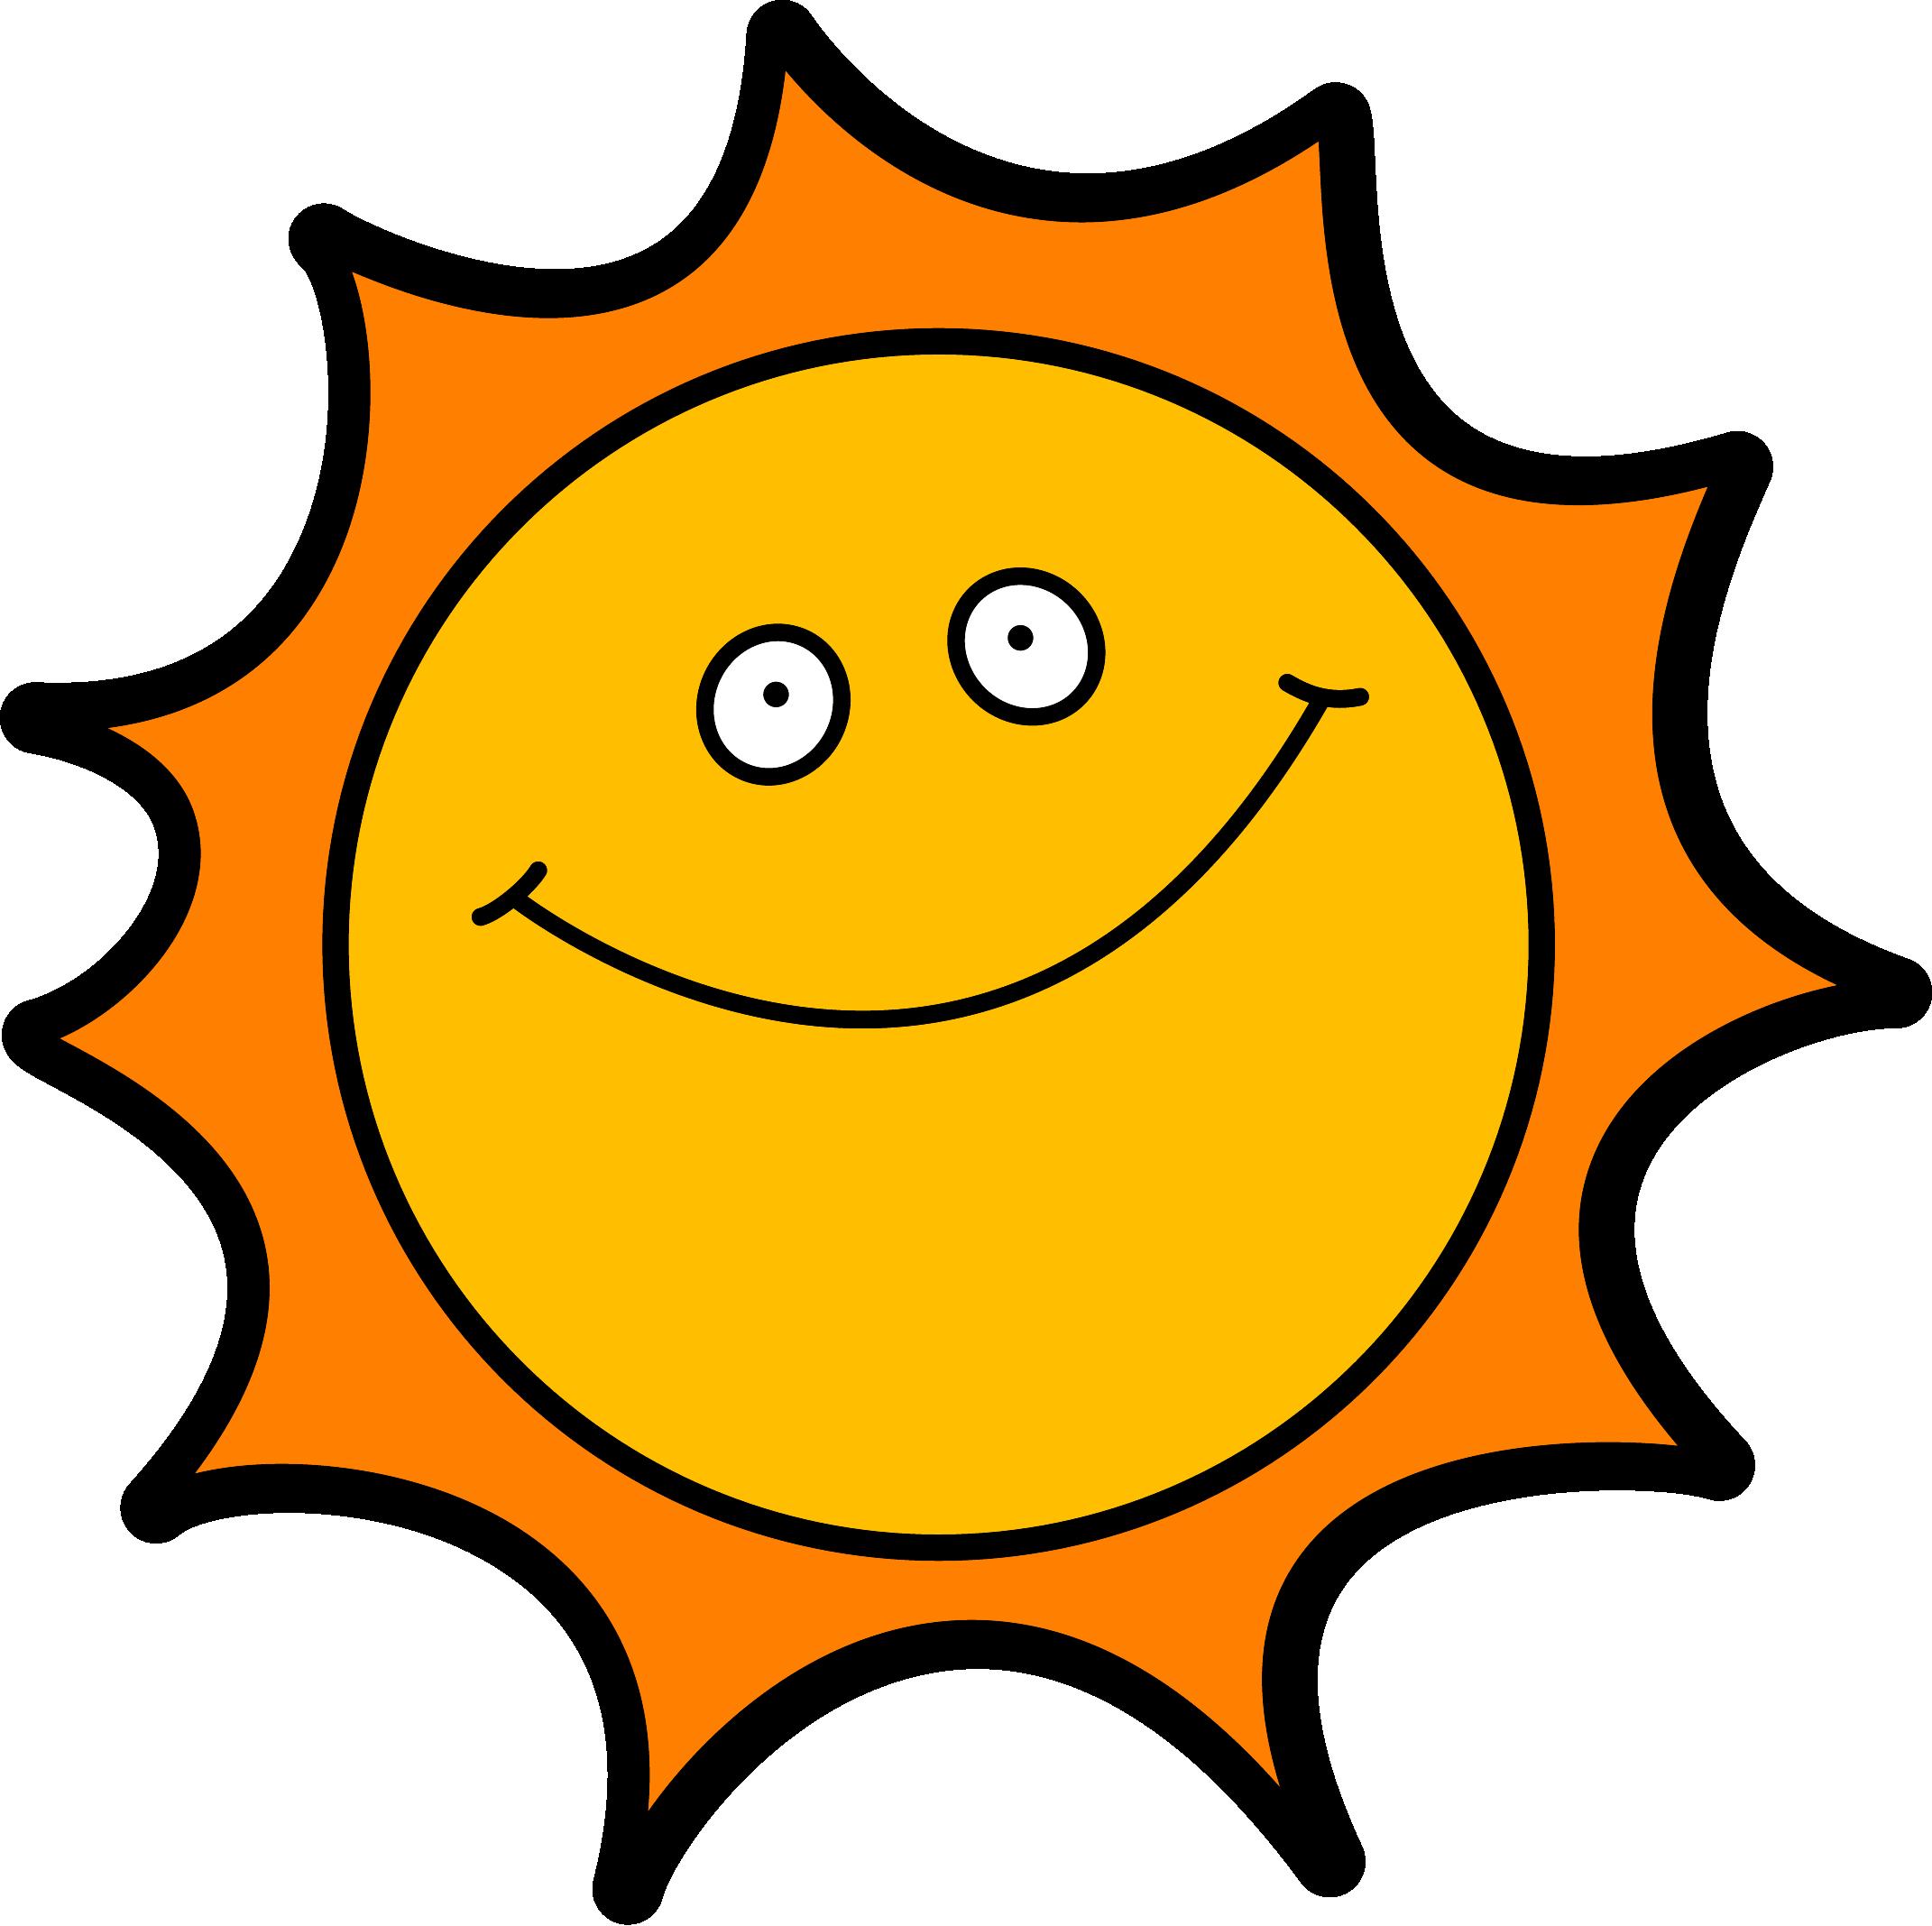 Hot Sun Images - ClipArt Best | Clipart Panda - Free Clipart Images